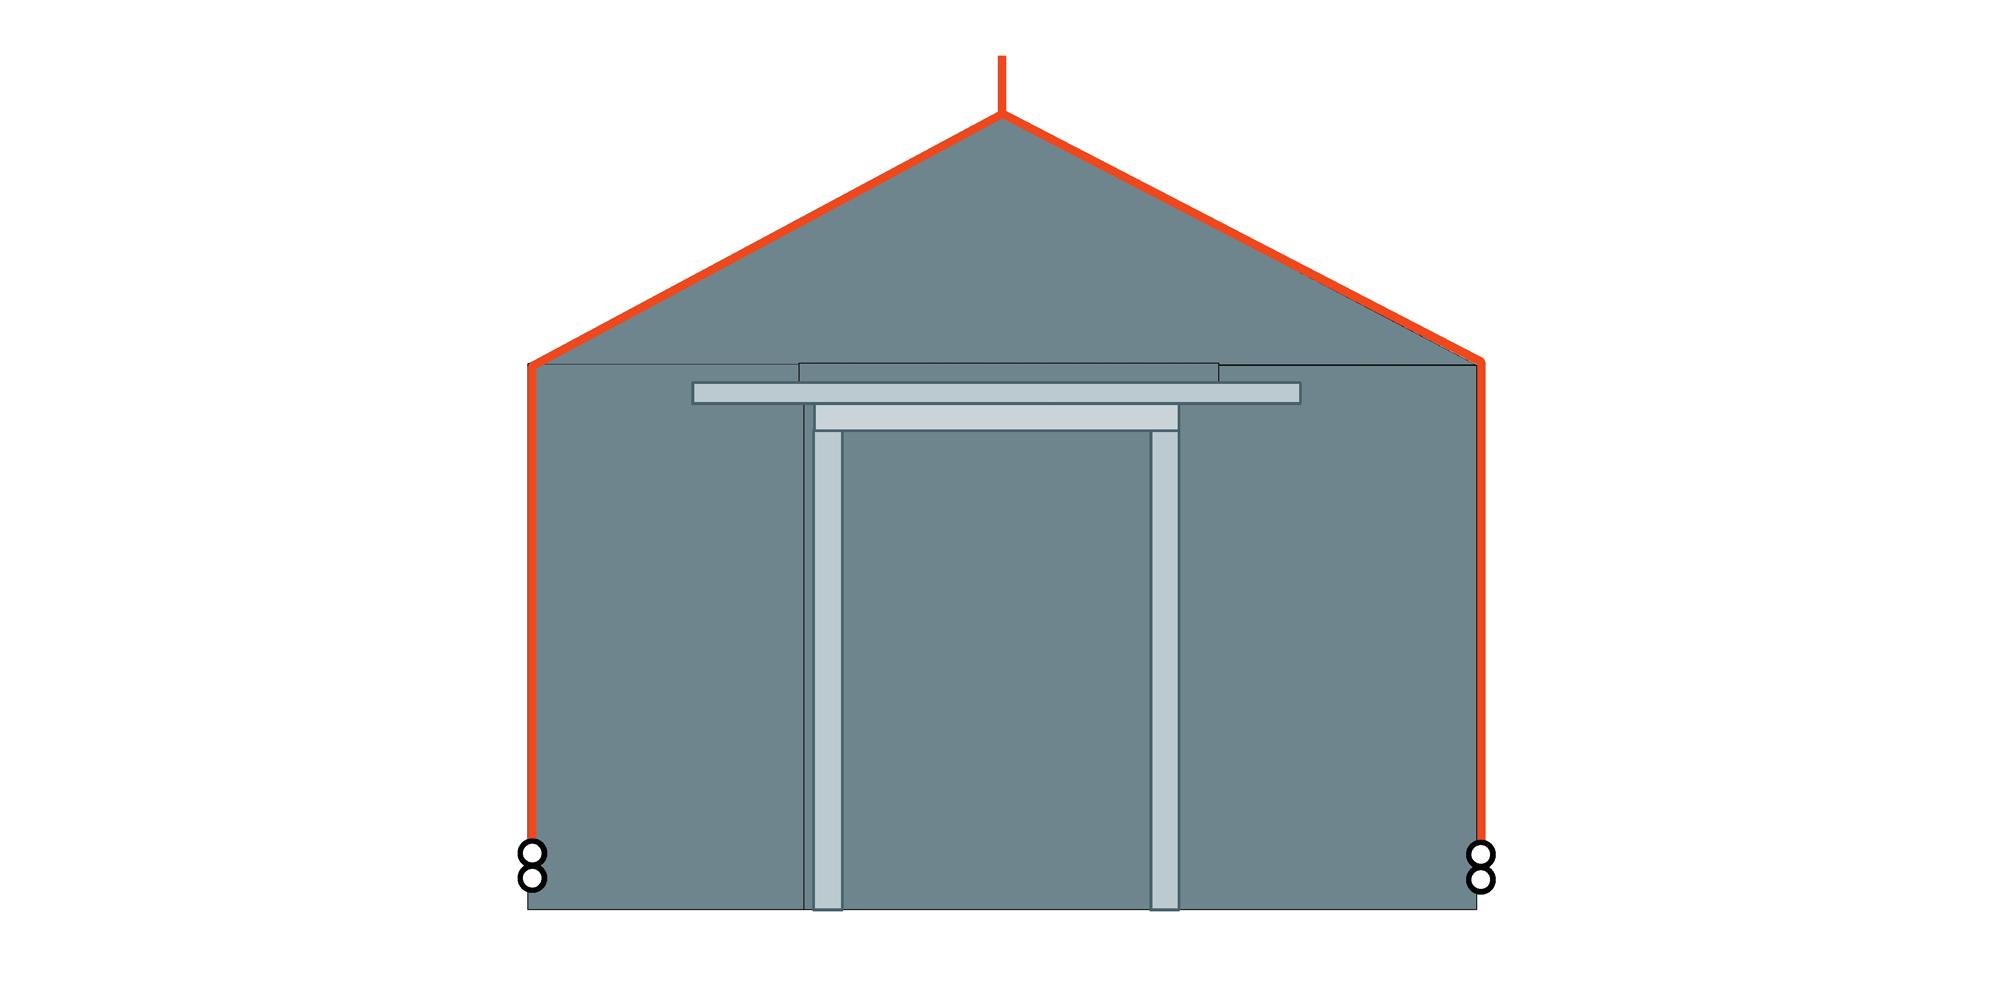 Bekannt Blitzschutz von Schutzhütten - VDE|ABB MA79